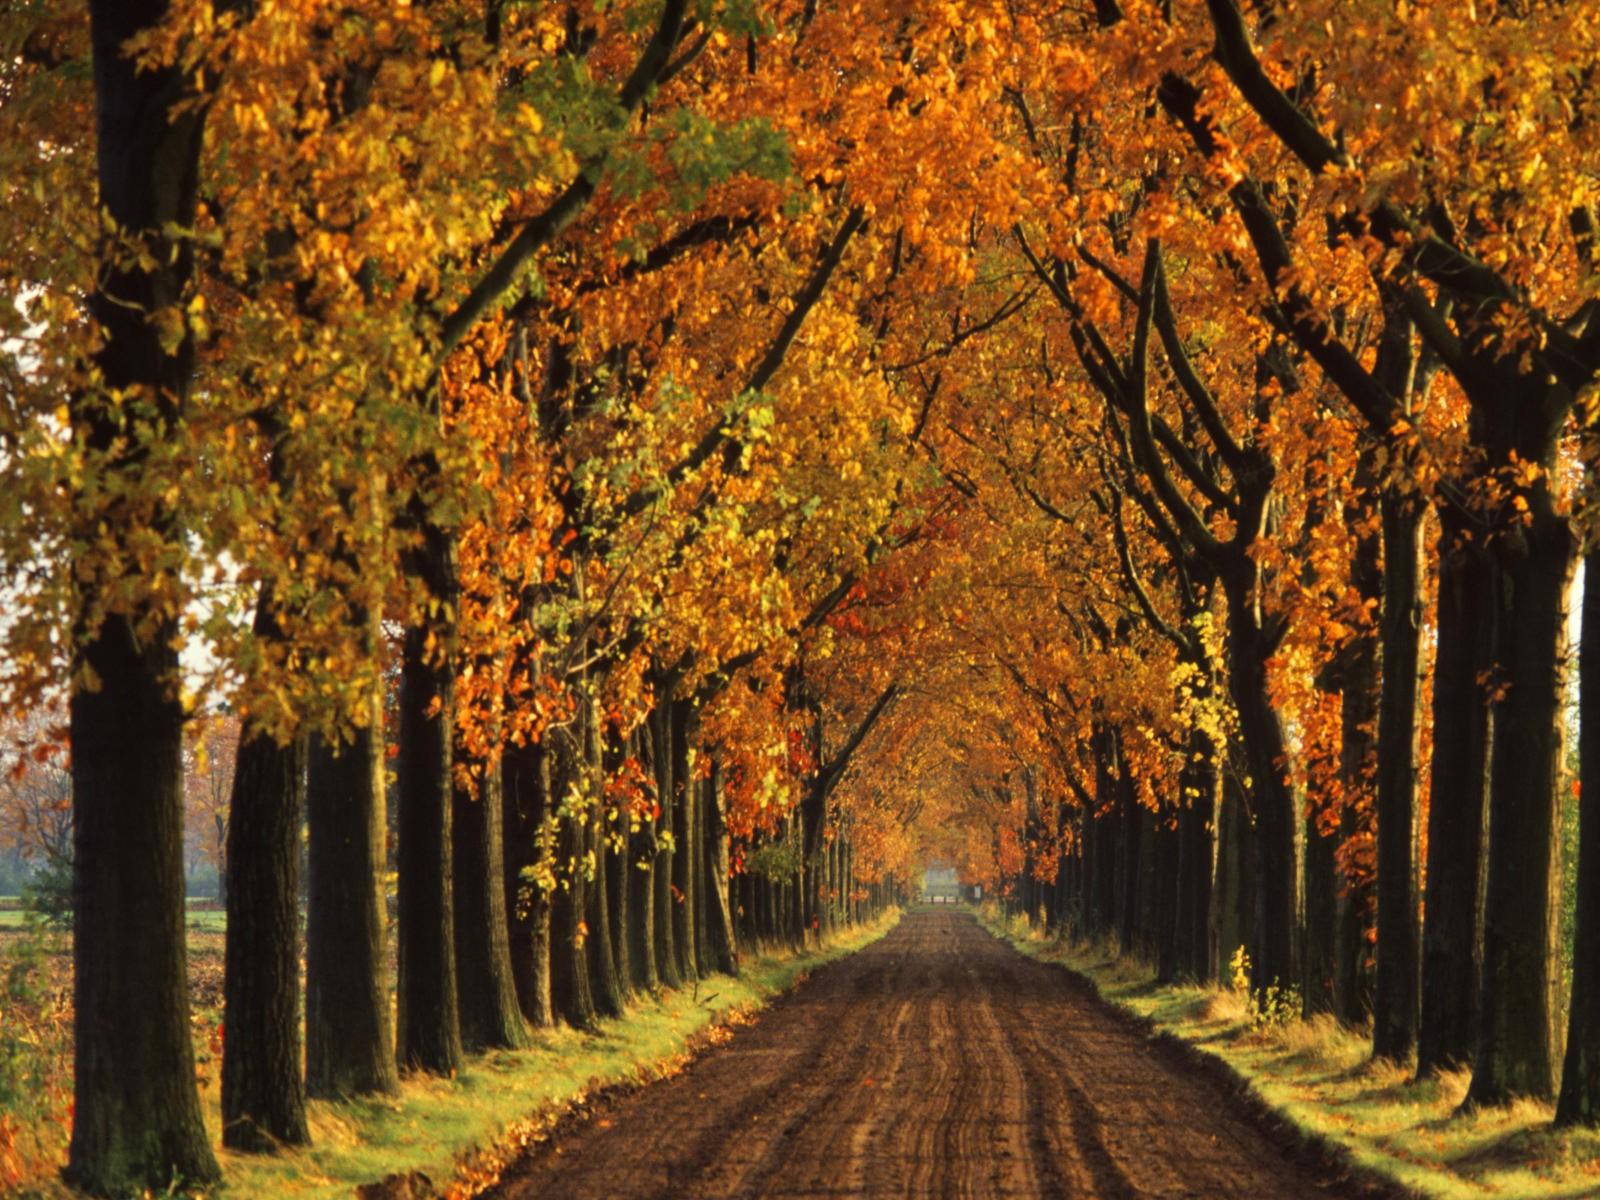 48 Free Early Fall Desktop Wallpapers On Wallpapersafari